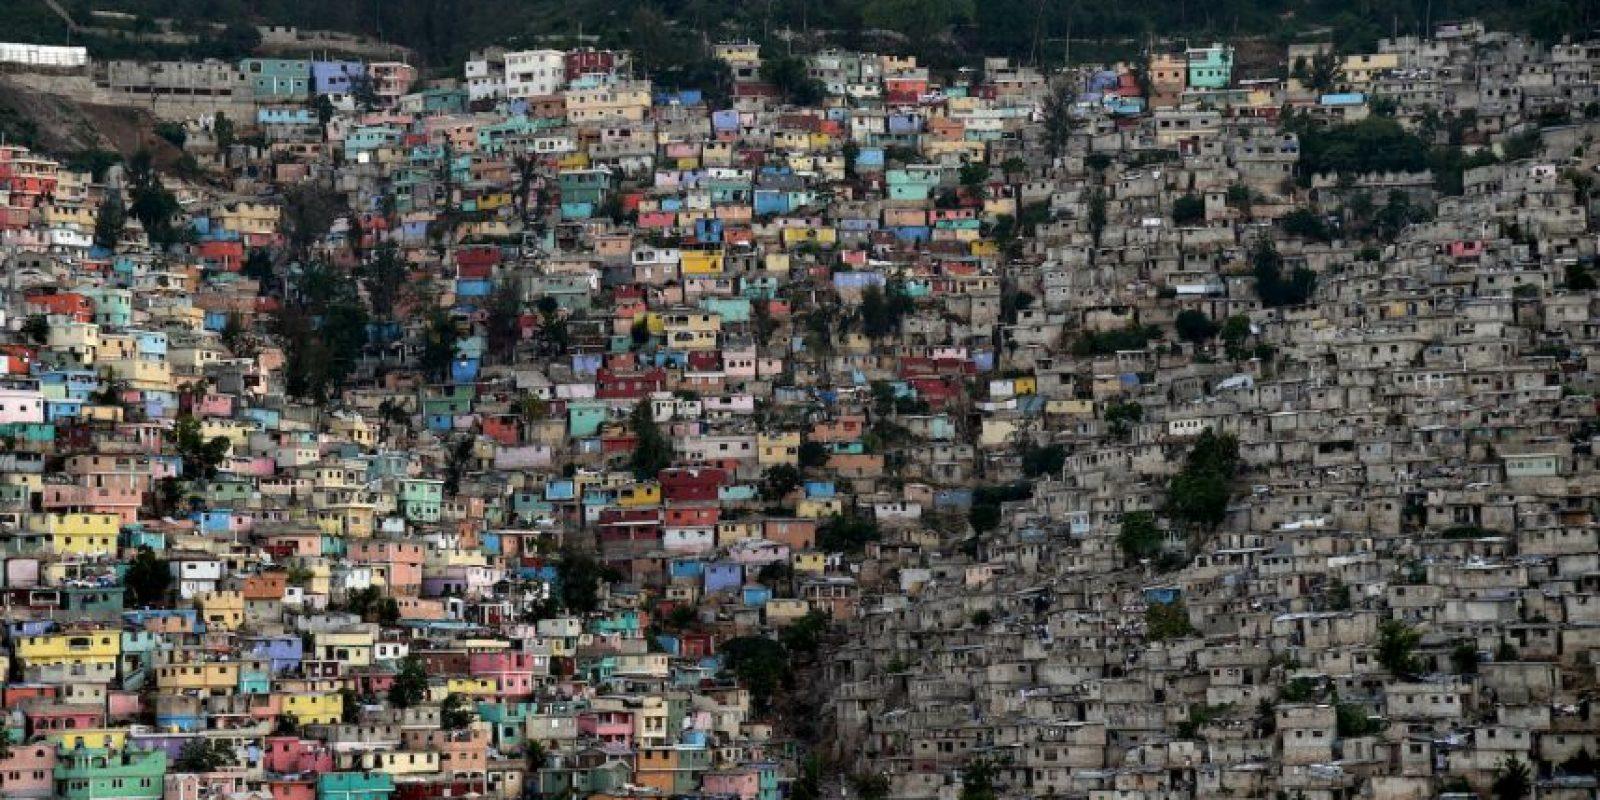 La vista de una comuna en Haití. Foto:AFP